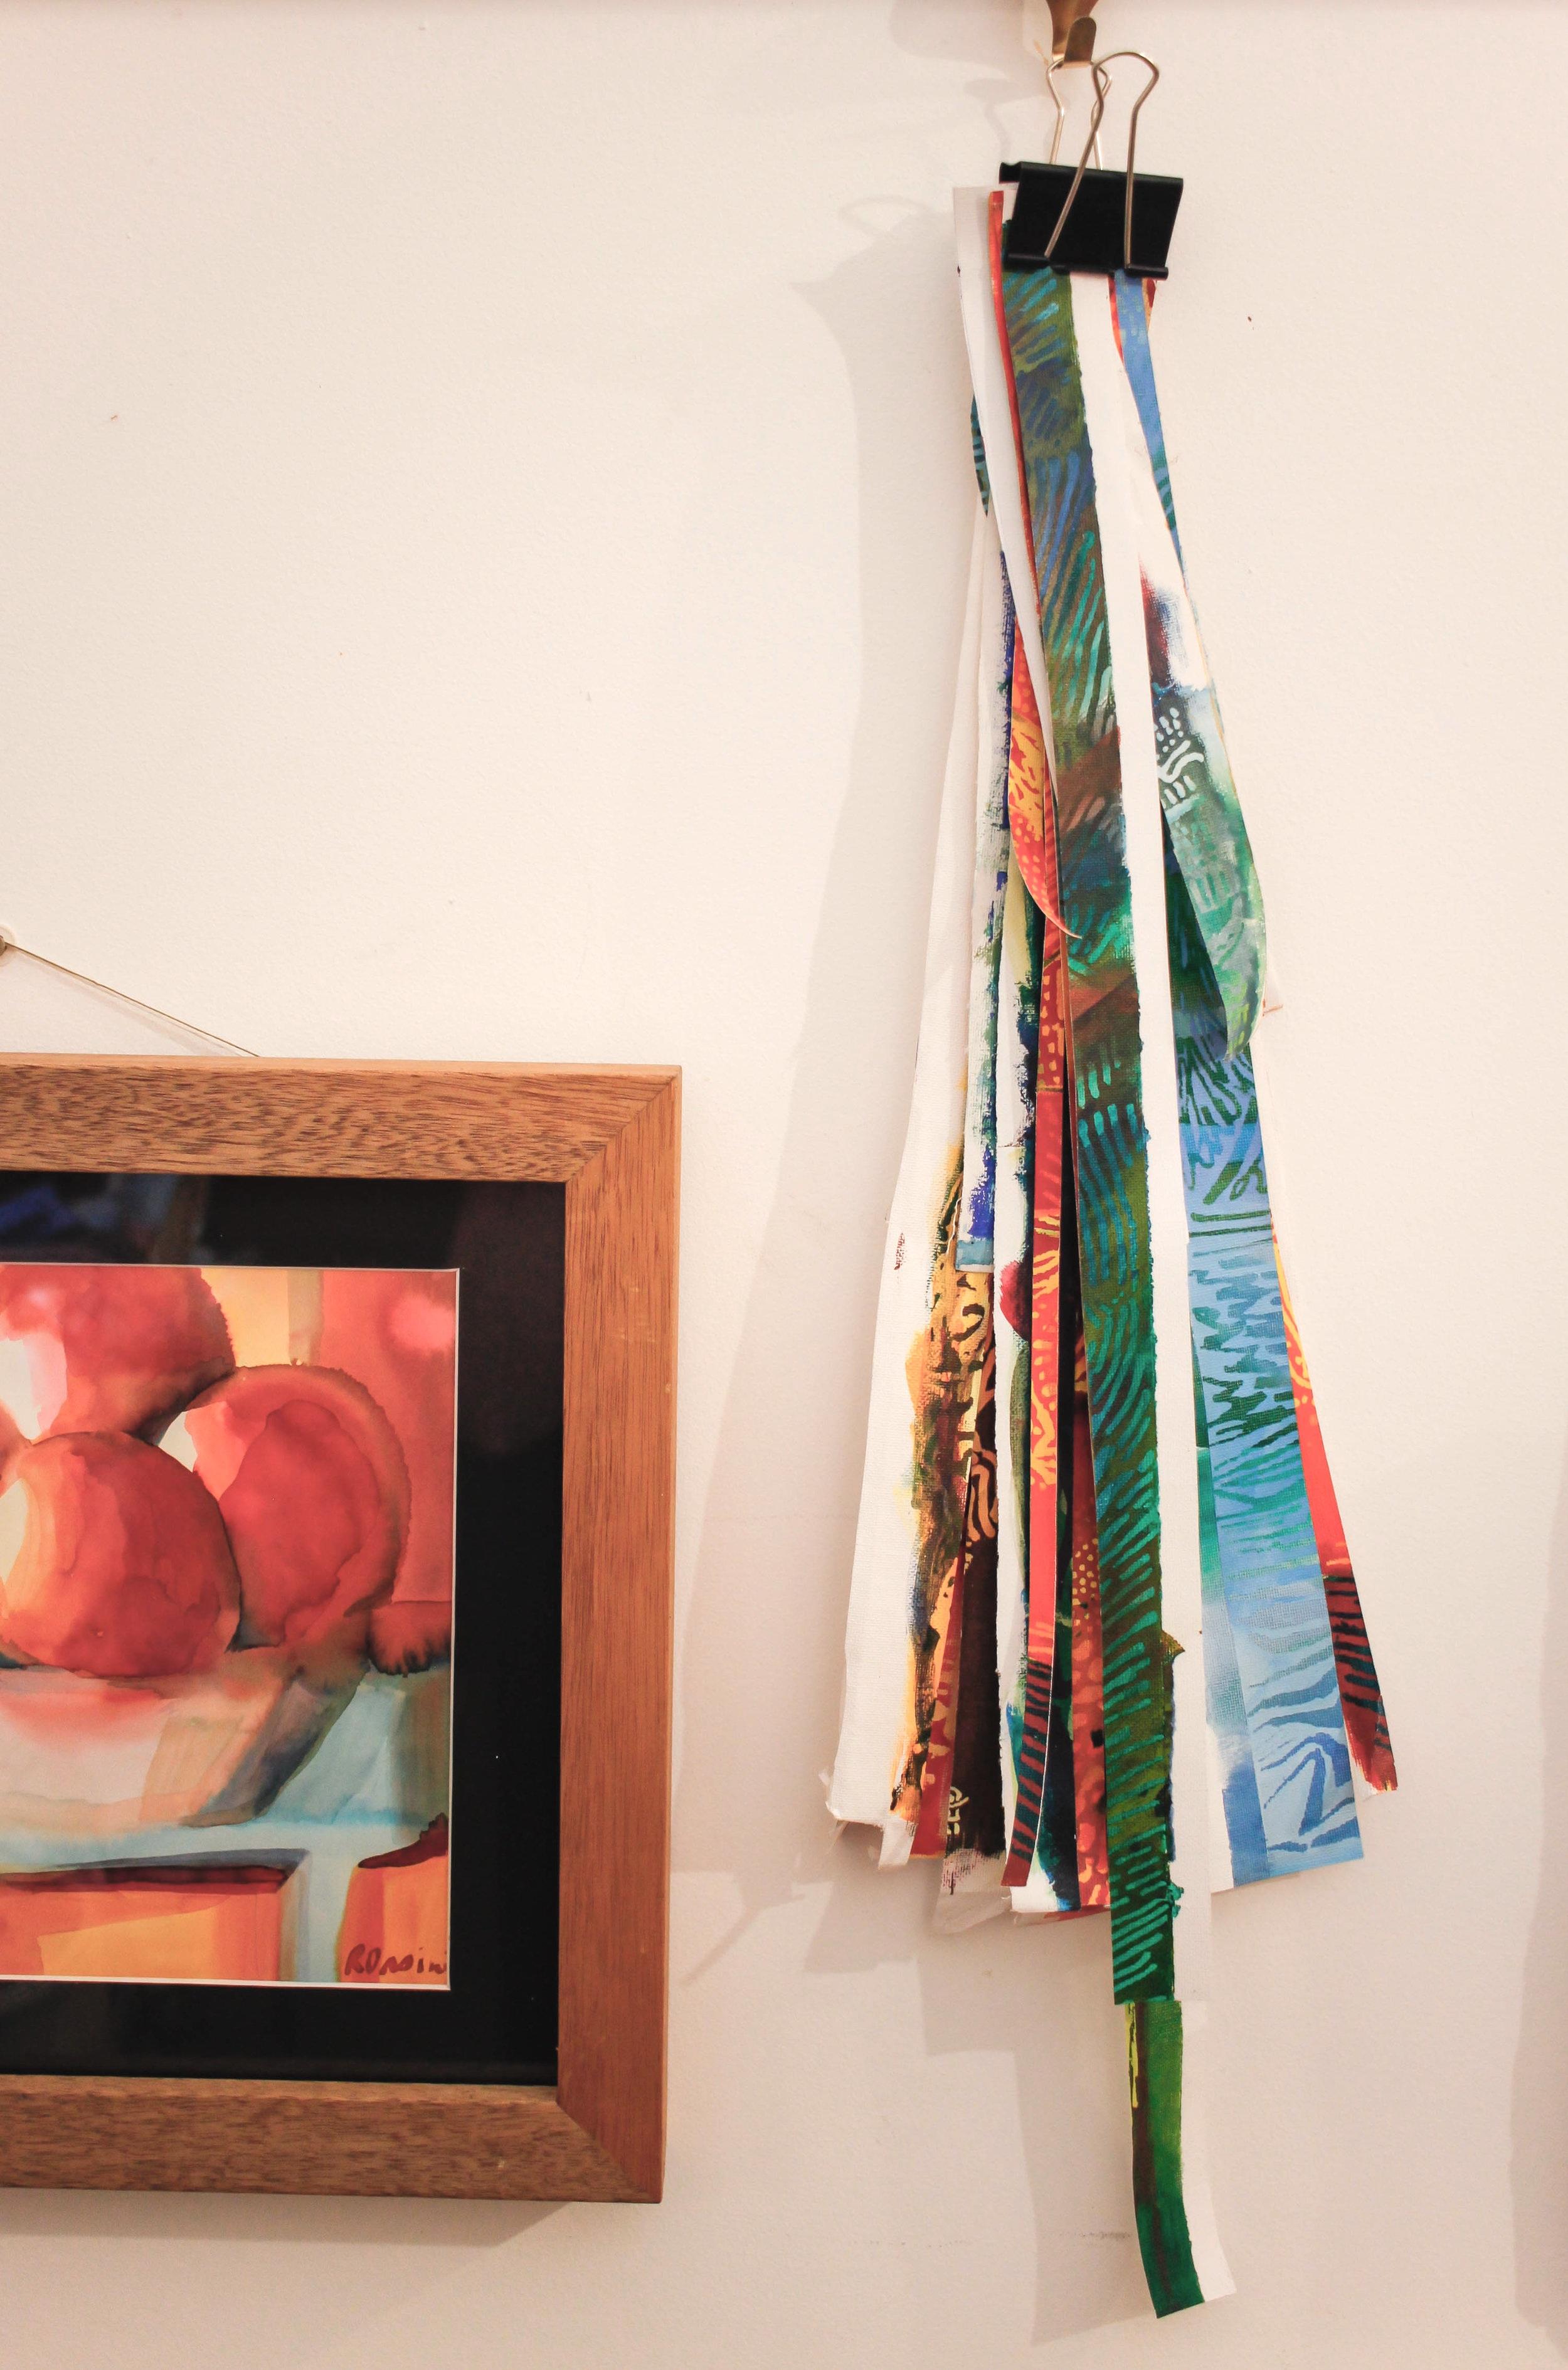 The Corner Store Gallery - studio visit with Rita Orsini